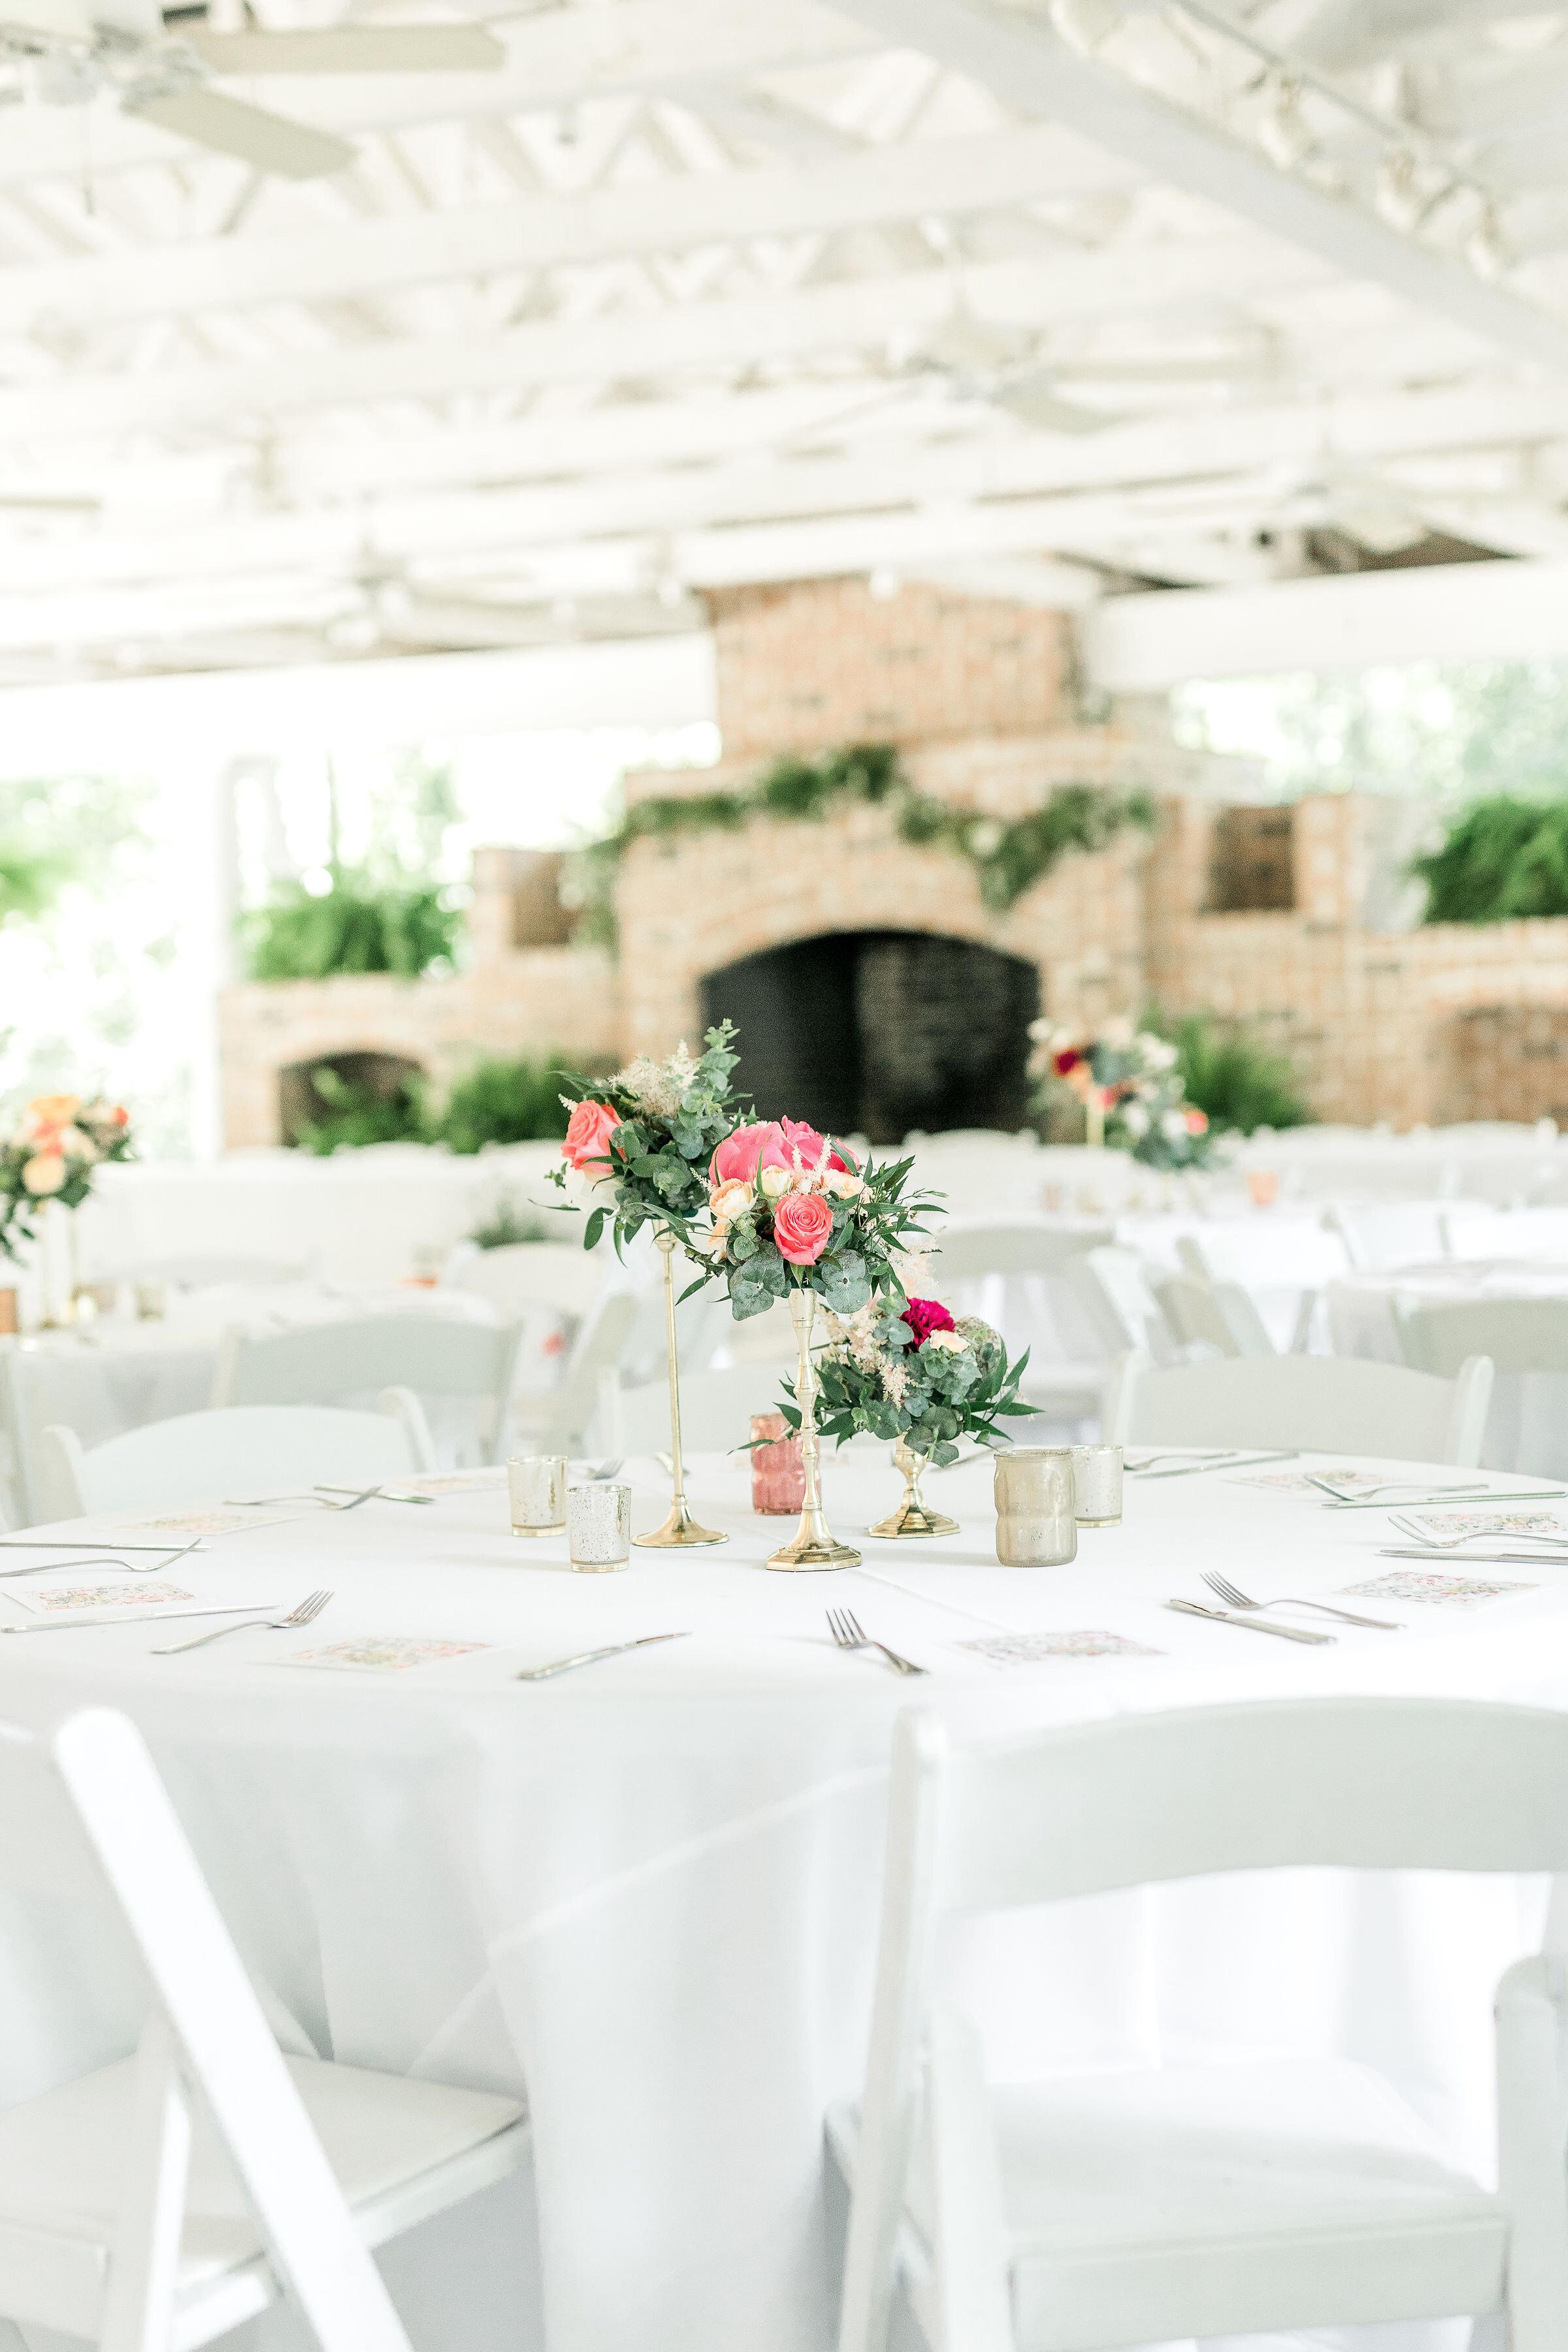 candlestick-centerpiece-hot-pink-flowers-boho-center-piece-tall-centerpieces-savannah-wedding-candle-centerpiece-white-and-hot-pink-centerpice-mackey-hosue-wedding-greenery-and-cloral-flowers.jpg